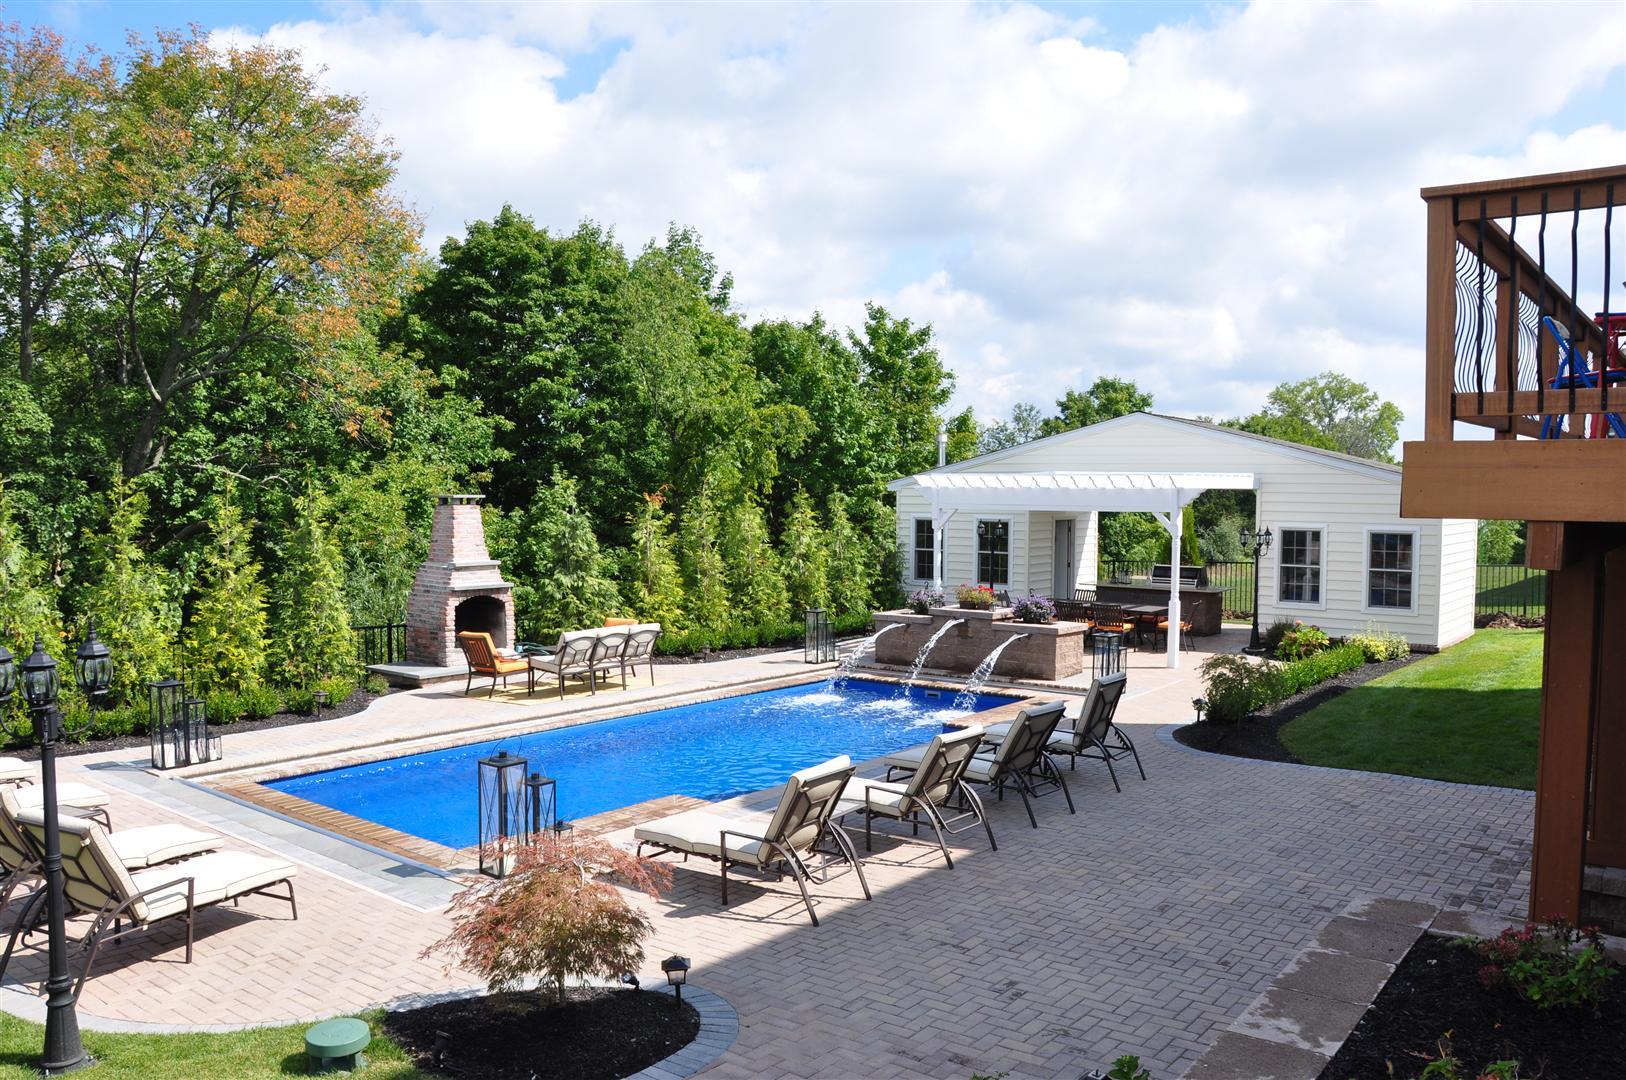 Patios Albert Group Landscaping Swimming Pools - Swimming-pool-patio-designs